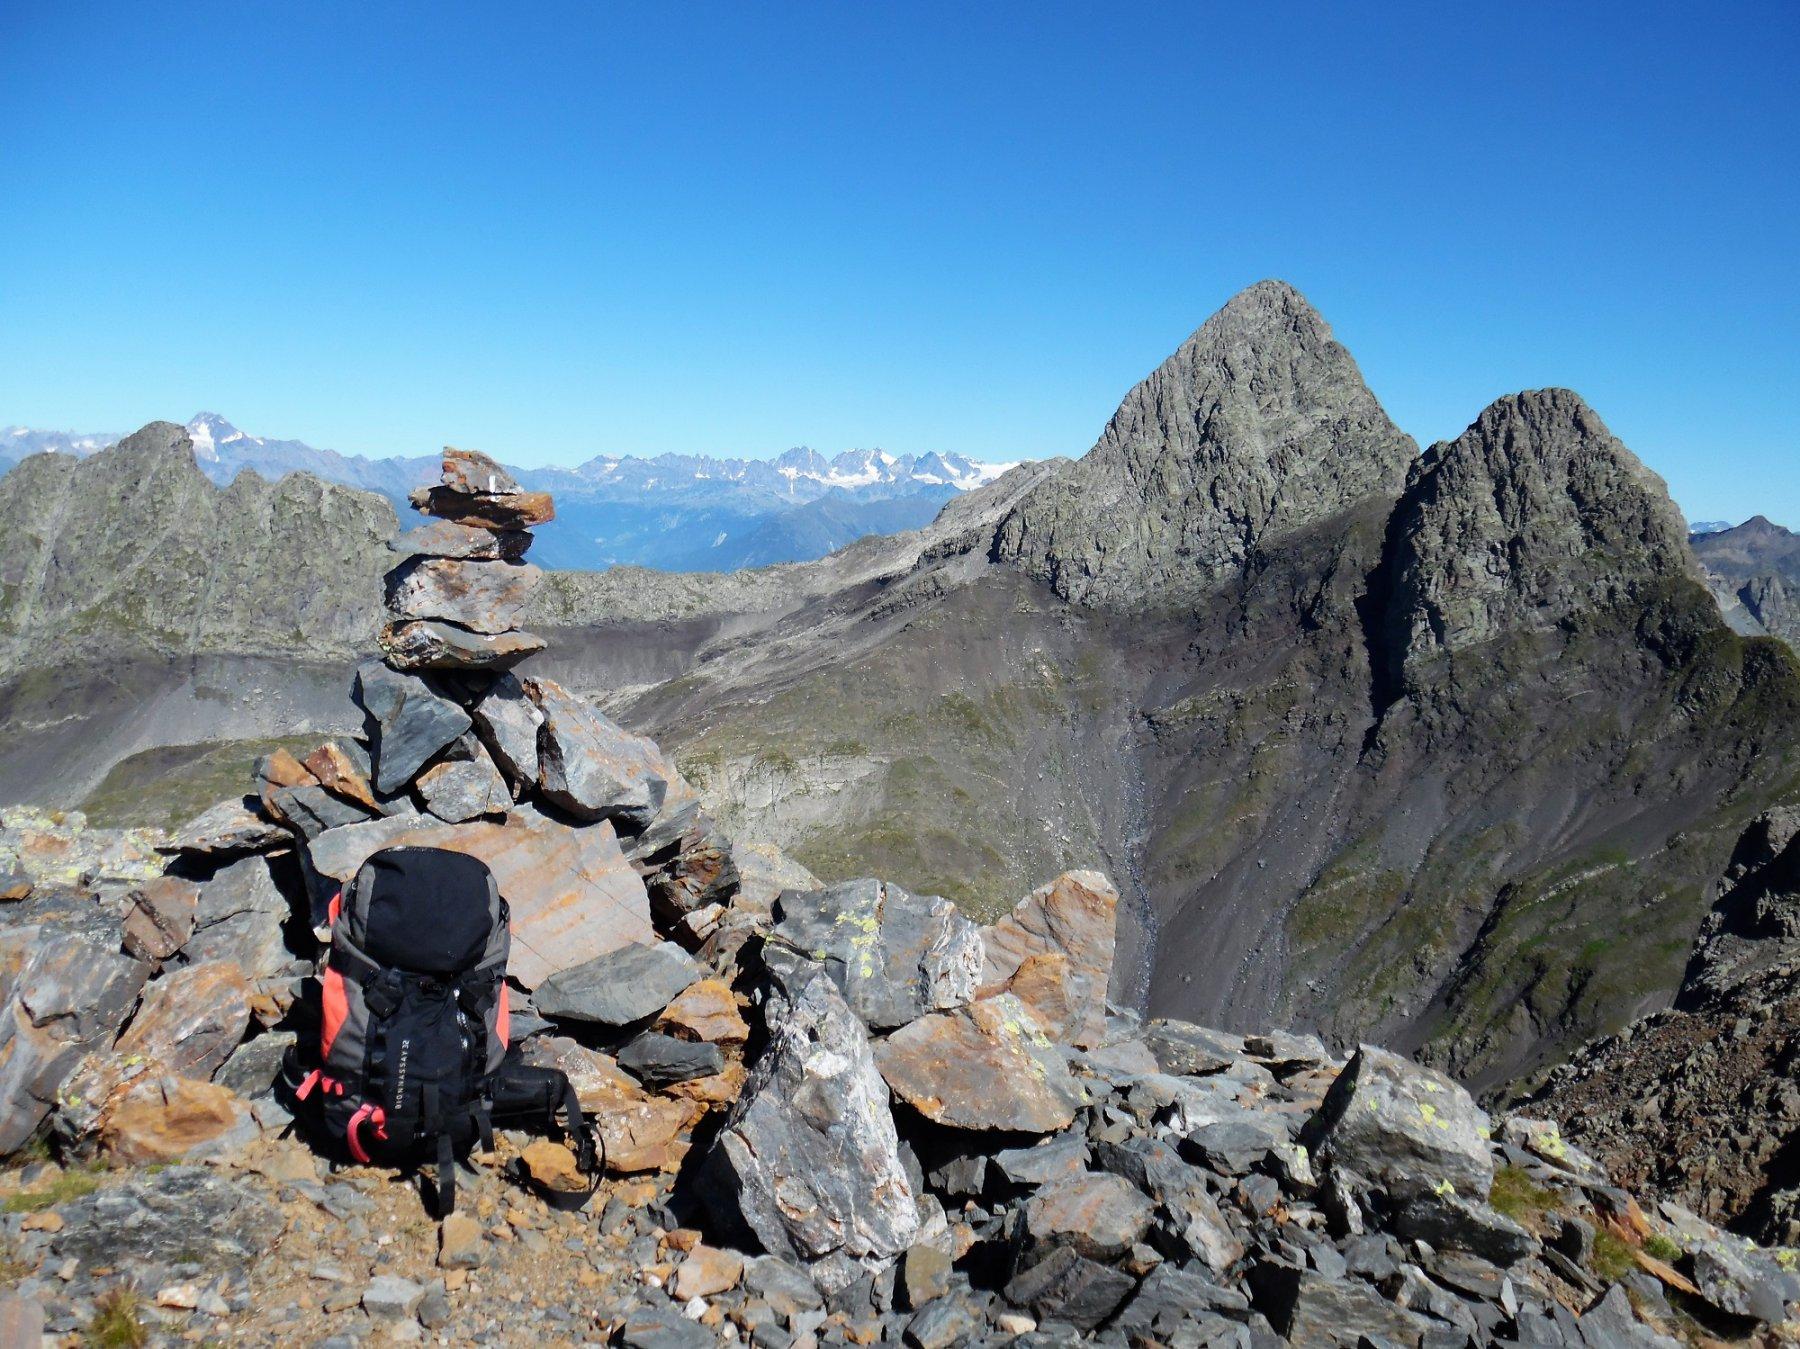 Grabiasca 2705 m. Dietro i Diavoli e il Rondenino